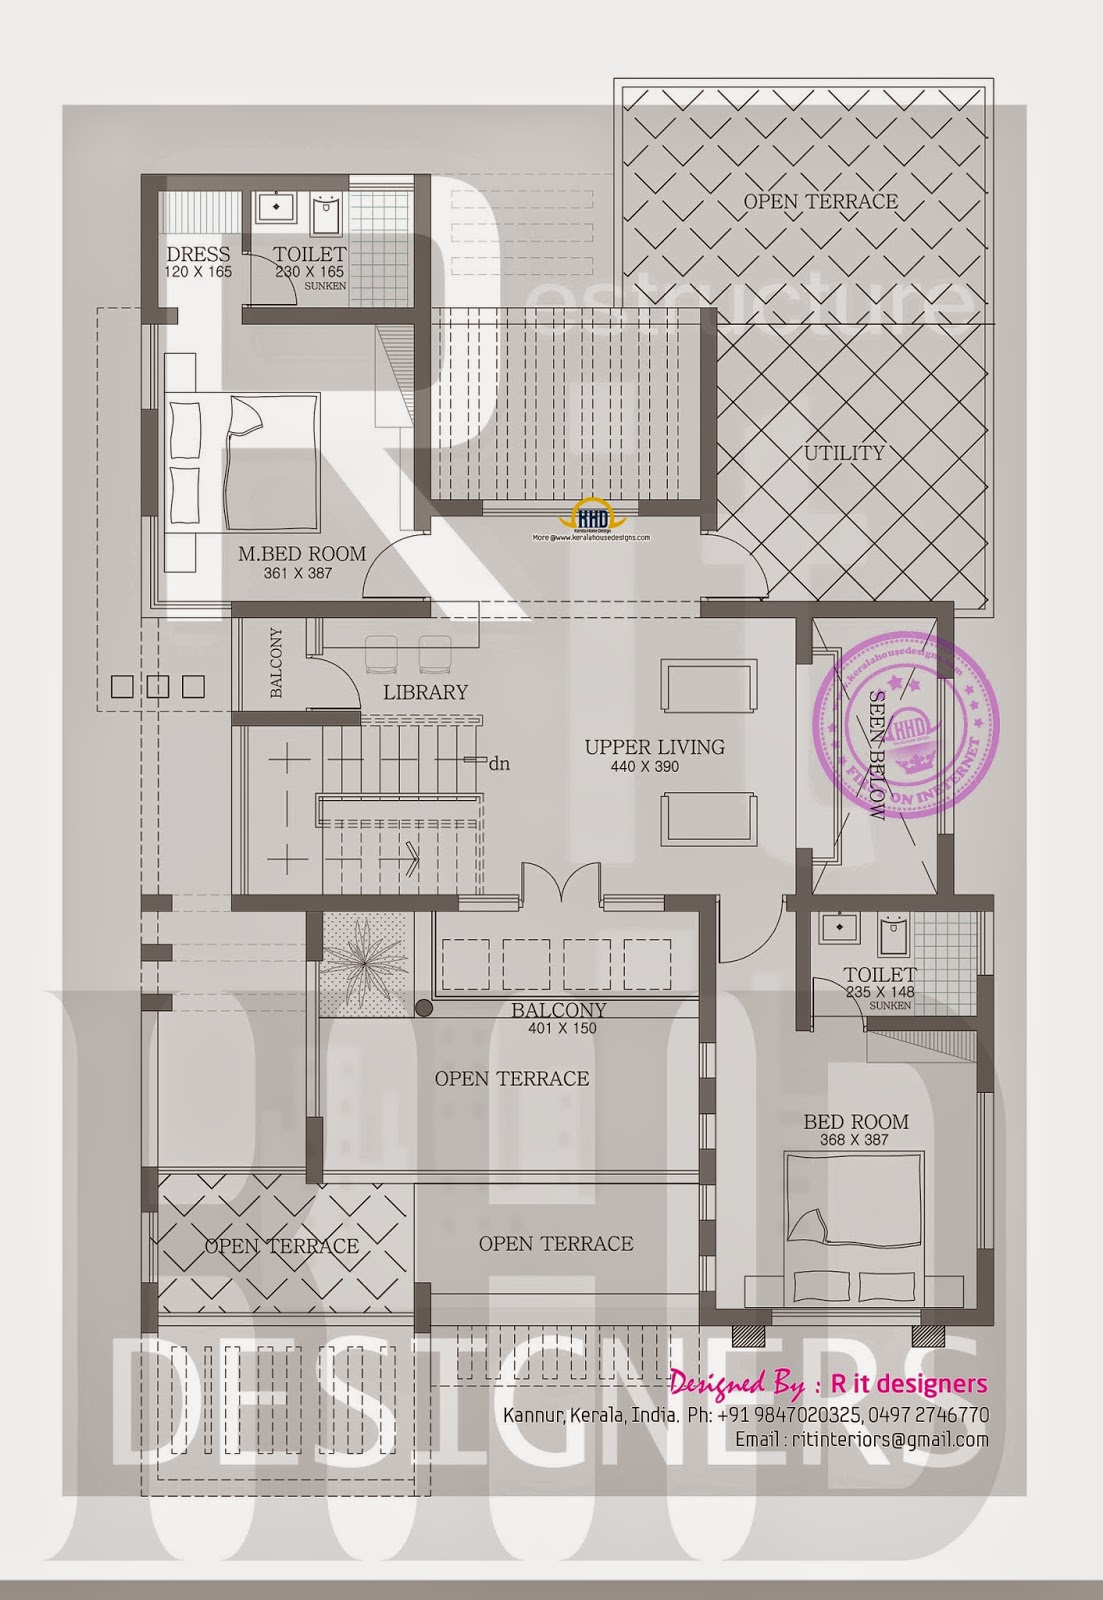 first floor plan - Designer House Plan 120 165